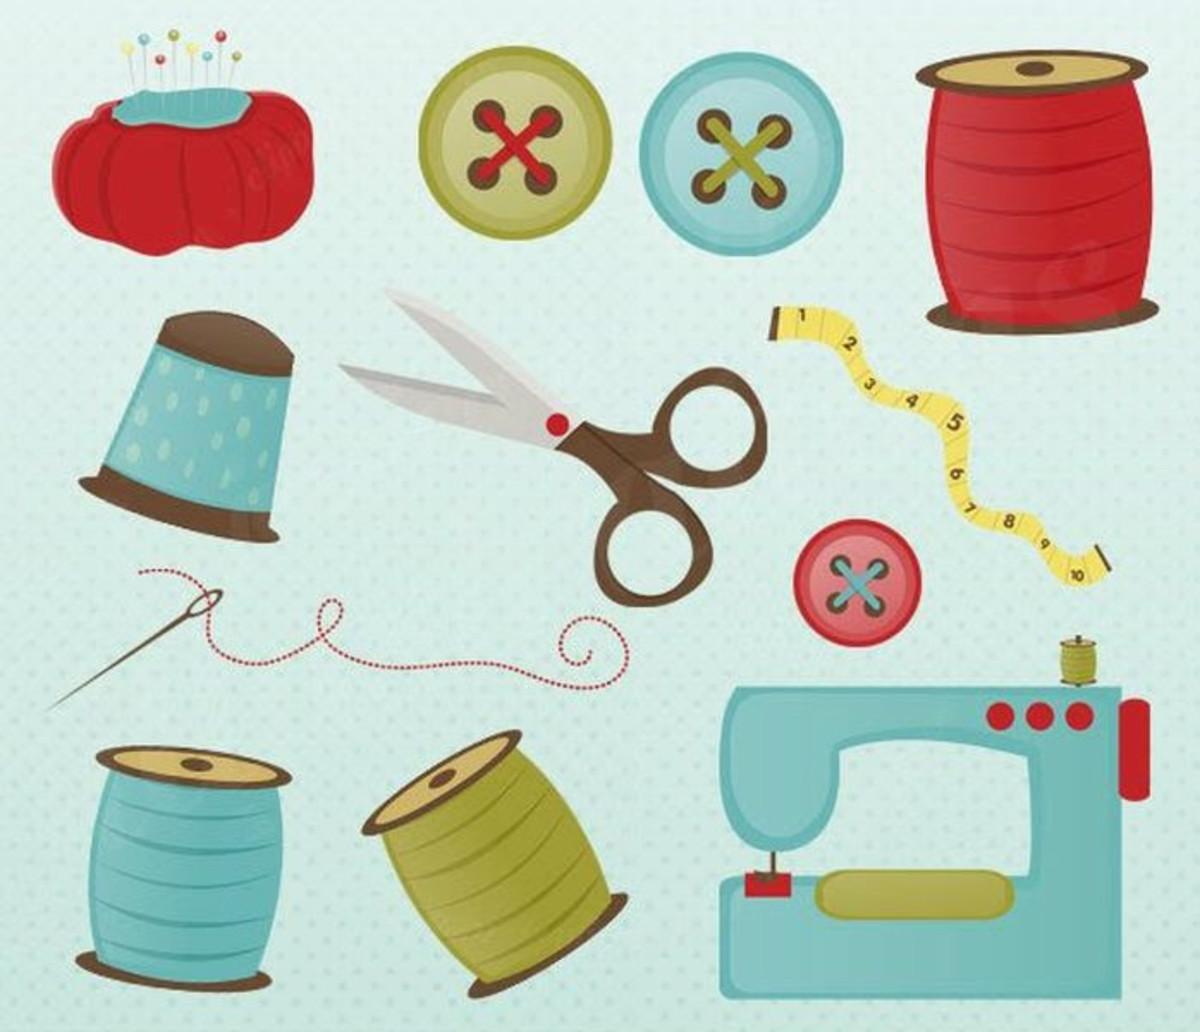 Costura clipart clipart freeuse download Kit Digital Meninas Atelier Costura Costureira Clipart JW clipart freeuse download